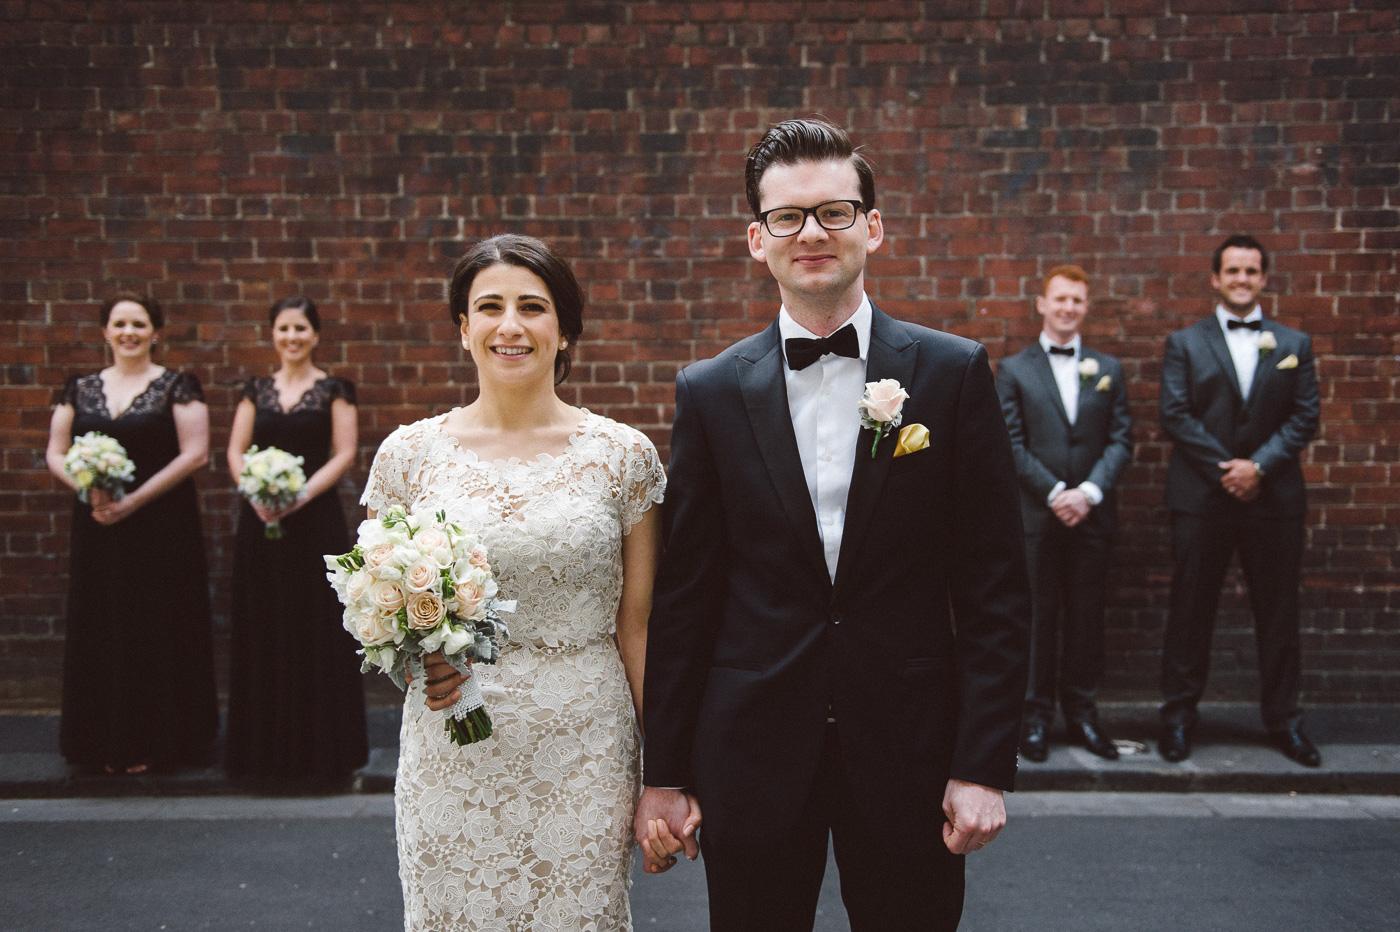 Melbourne-brickwall-wedding-photo